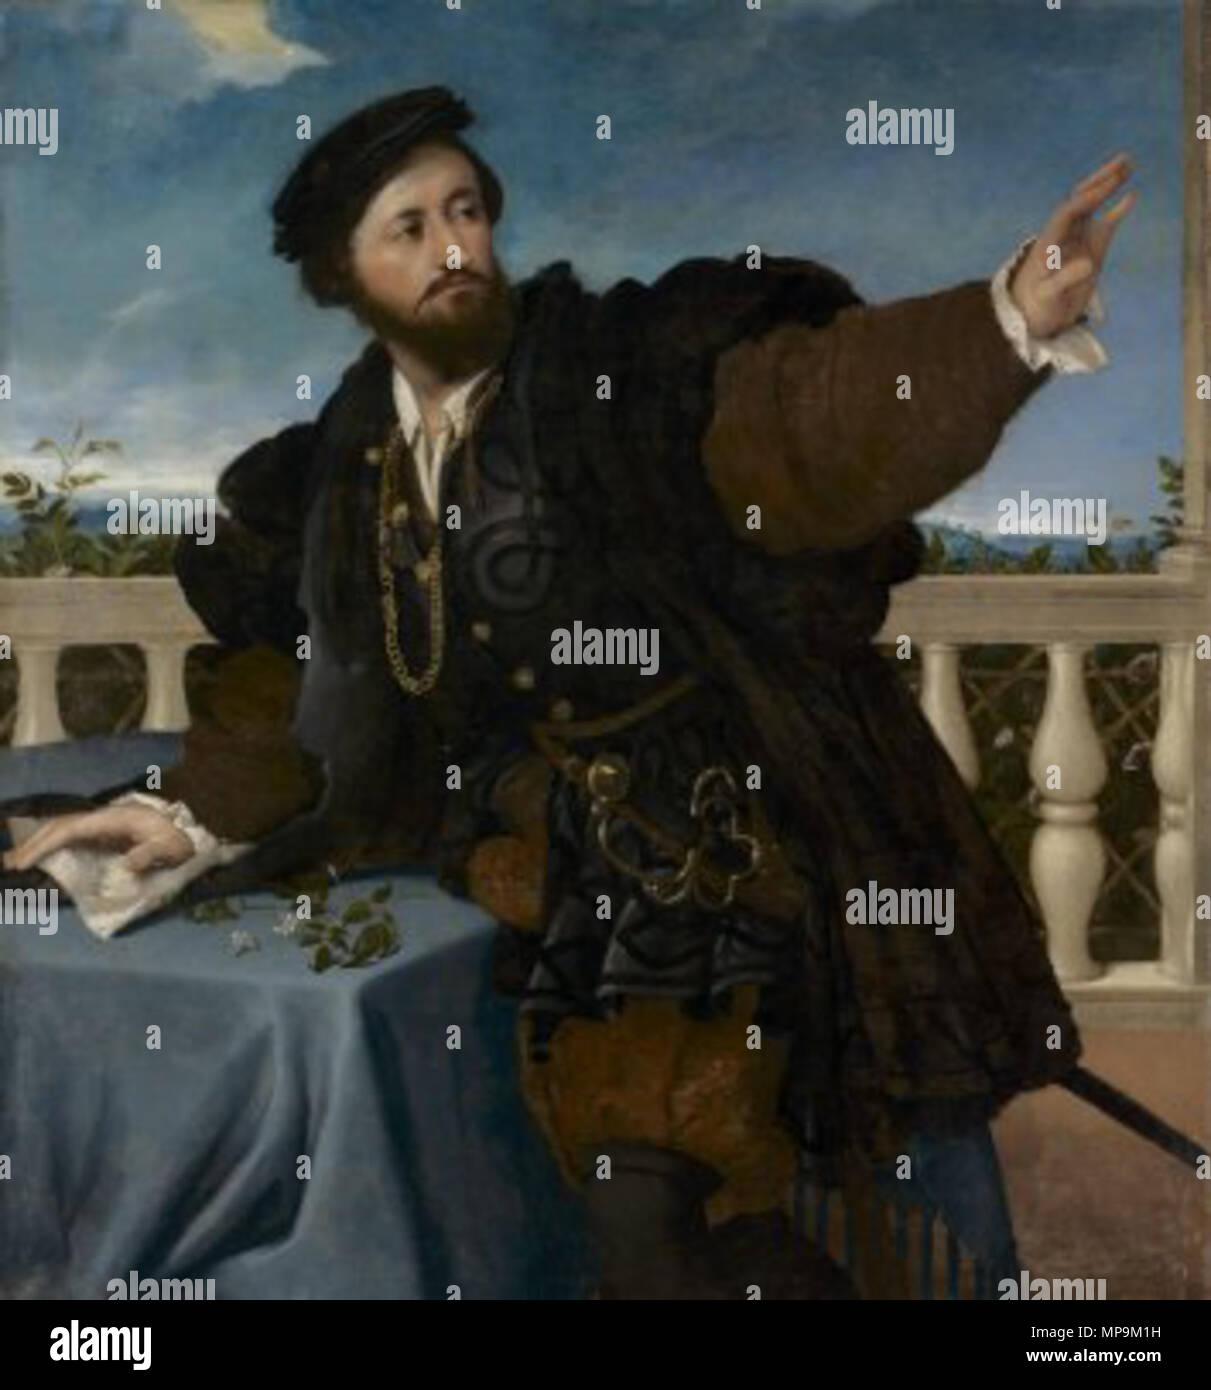 . A Nobleman on a Balcony . 1525.   Lorenzo Lotto (1480–)   Description Italian painter and fresco painter  Date of birth/death circa 1480 1556 / 1557  Location of birth/death Venice Loreto  Work location Recanati (1506-1508), Venice (1500), Treviso (1503-1506), Rome (1509-1512), Bergamo (1513-1525), Venice (1513-1517), Treviso (1525-1527), Venice (1527-1529), Loreto, Venice (1529-1539), Treviso (1540-1549), Ancona (1549), Loreto (1556)  Authority control  : Q310973 VIAF:22165049 ISNI:0000 0001 2320 0265 ULAN:500015631 LCCN:n50042418 NLA:35692463 WorldCat 820 Lorenzo Lotto 090 - Stock Image